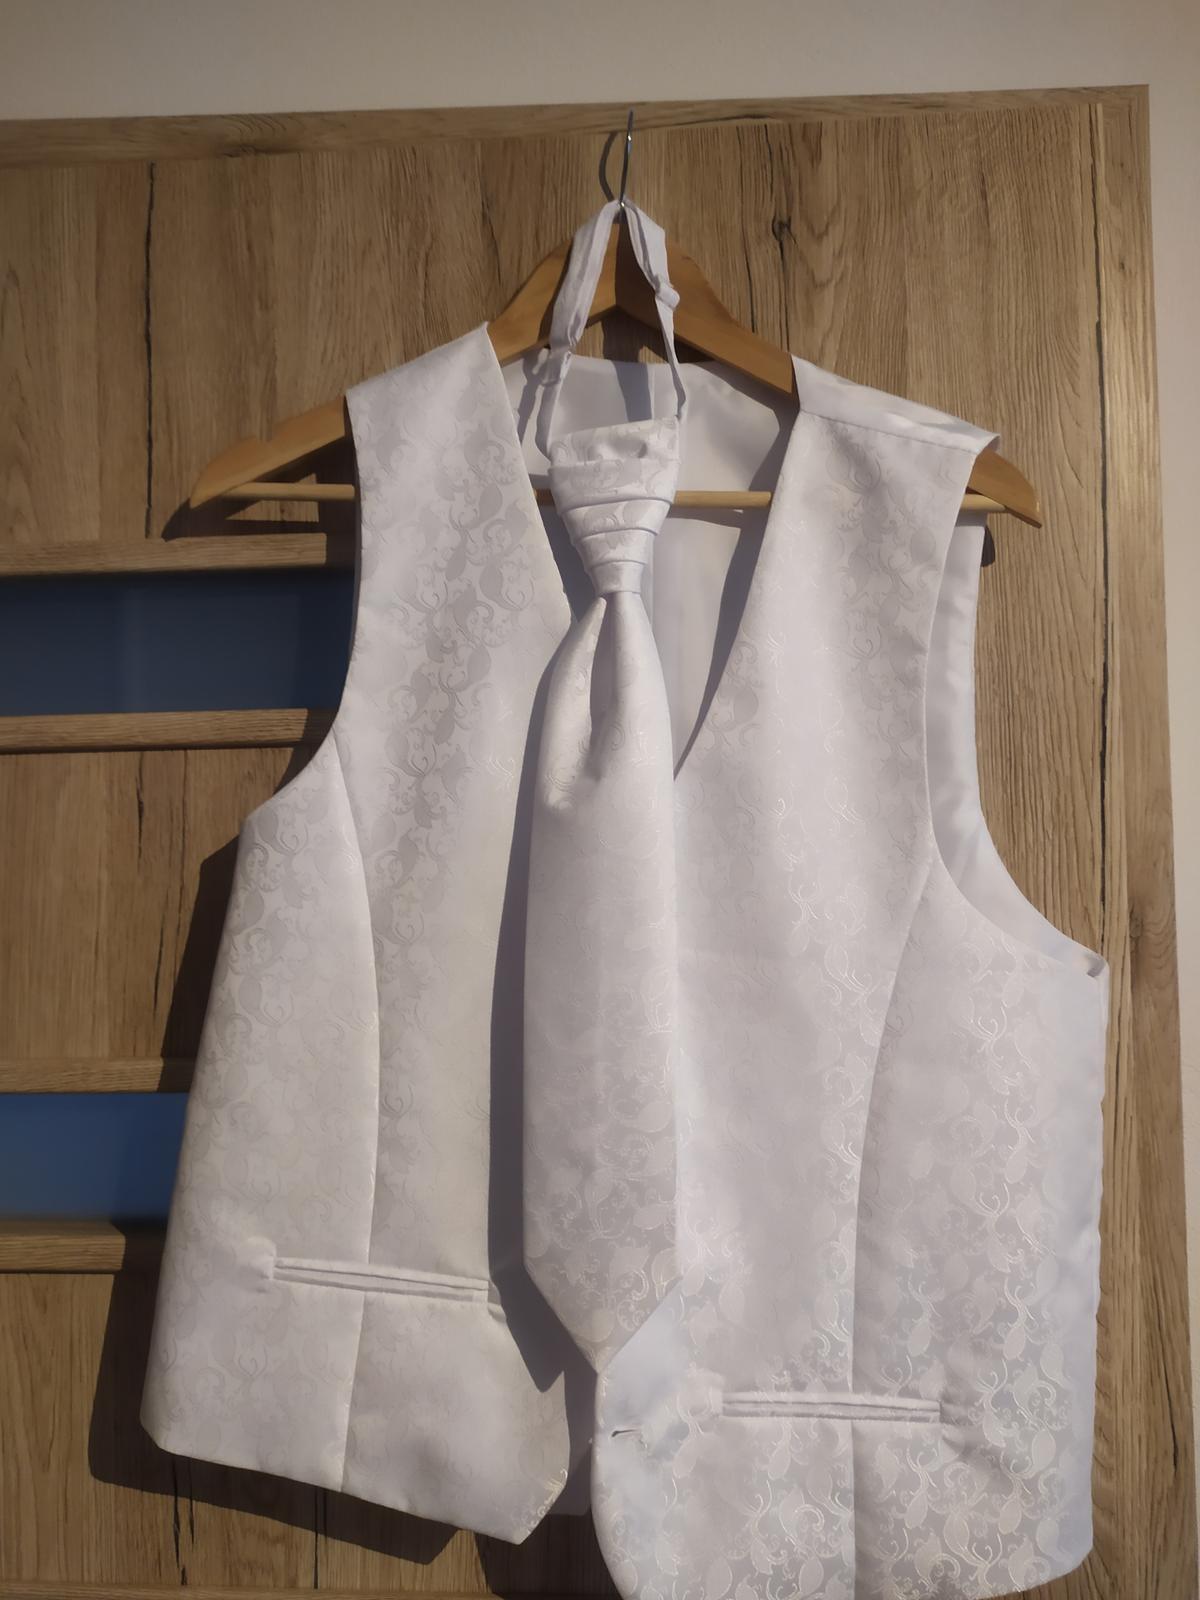 Biela panska vesta s kravatou - Obrázok č. 1